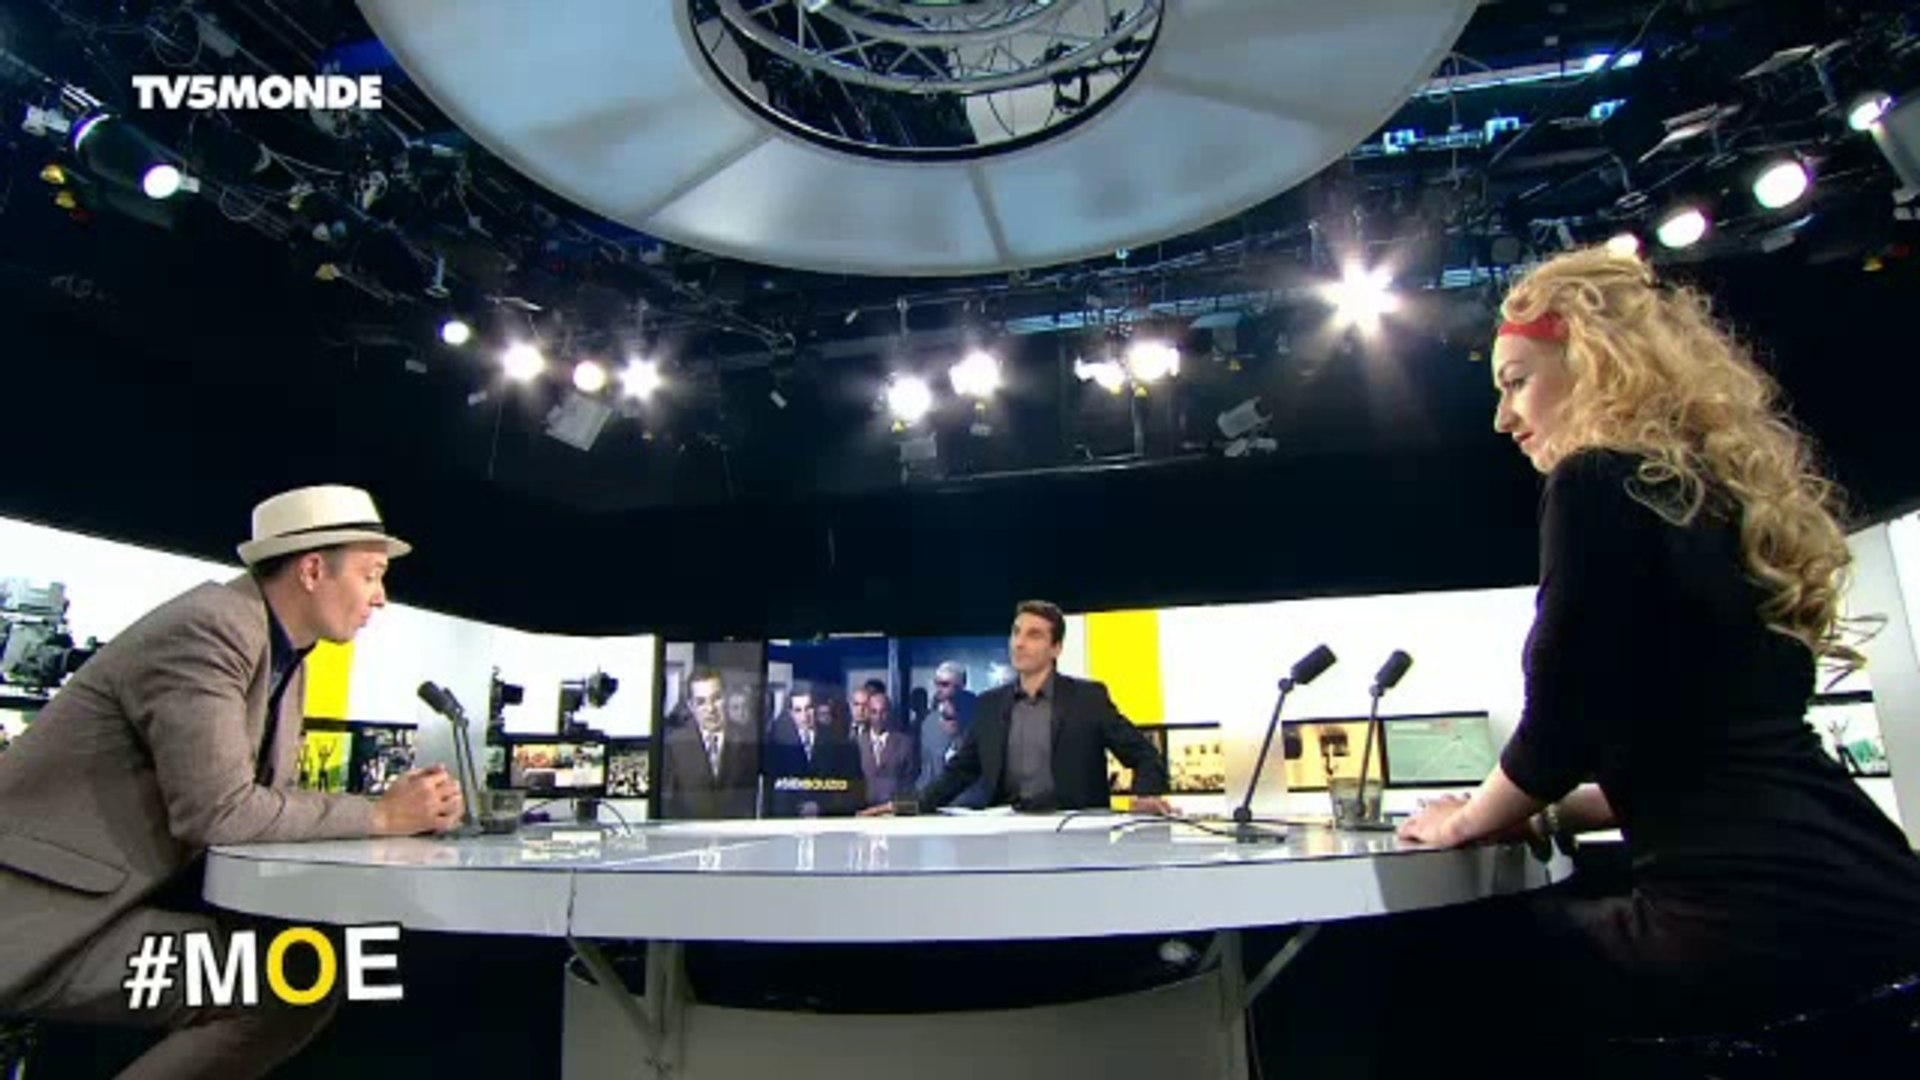 #MOE : Cocktail Mare Nostrum #5 sur TV5MONDE